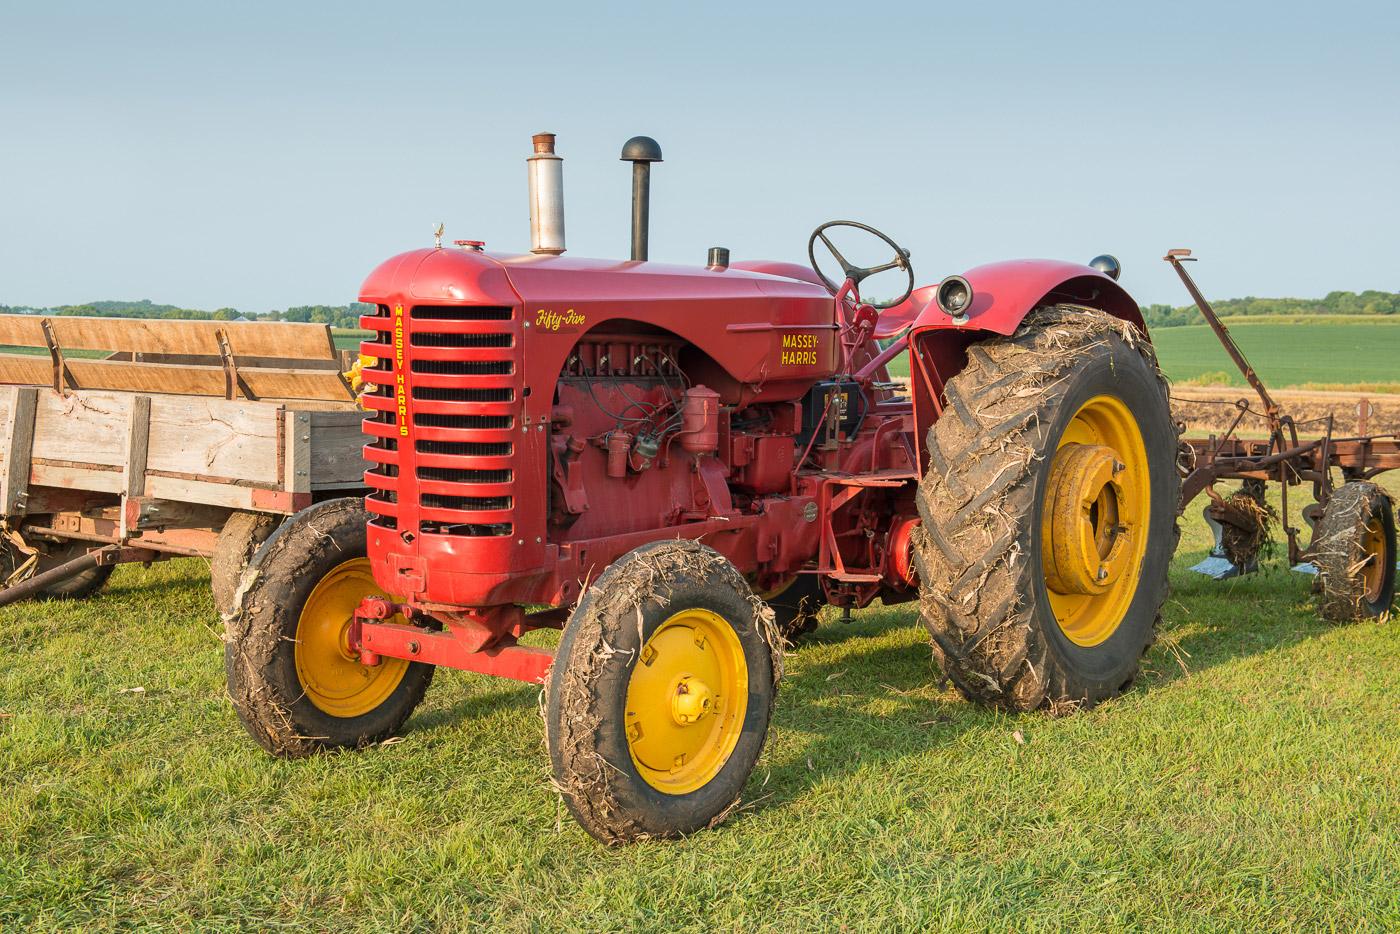 Massey-Harris, antique tractor, tractor, vintage tractor, photo